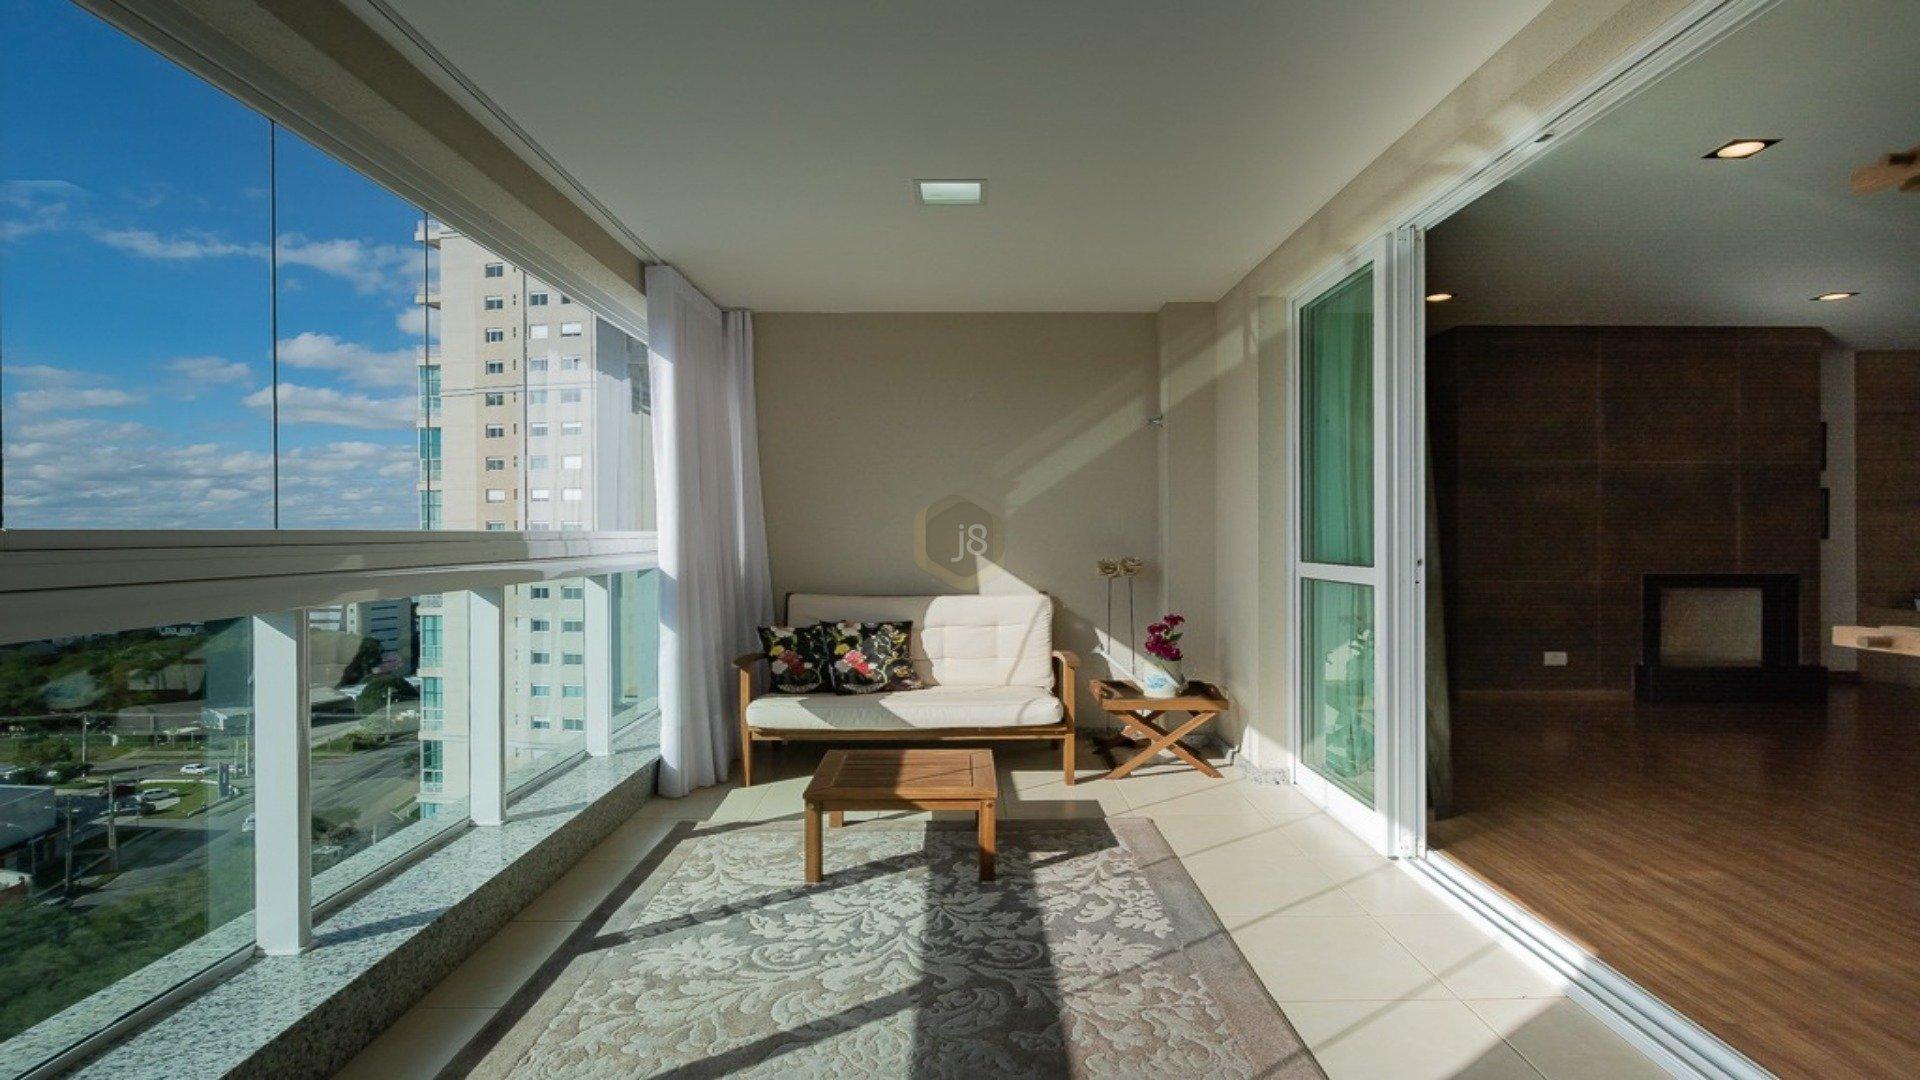 Foto de destaque Excelente apartamento no ecoville!!